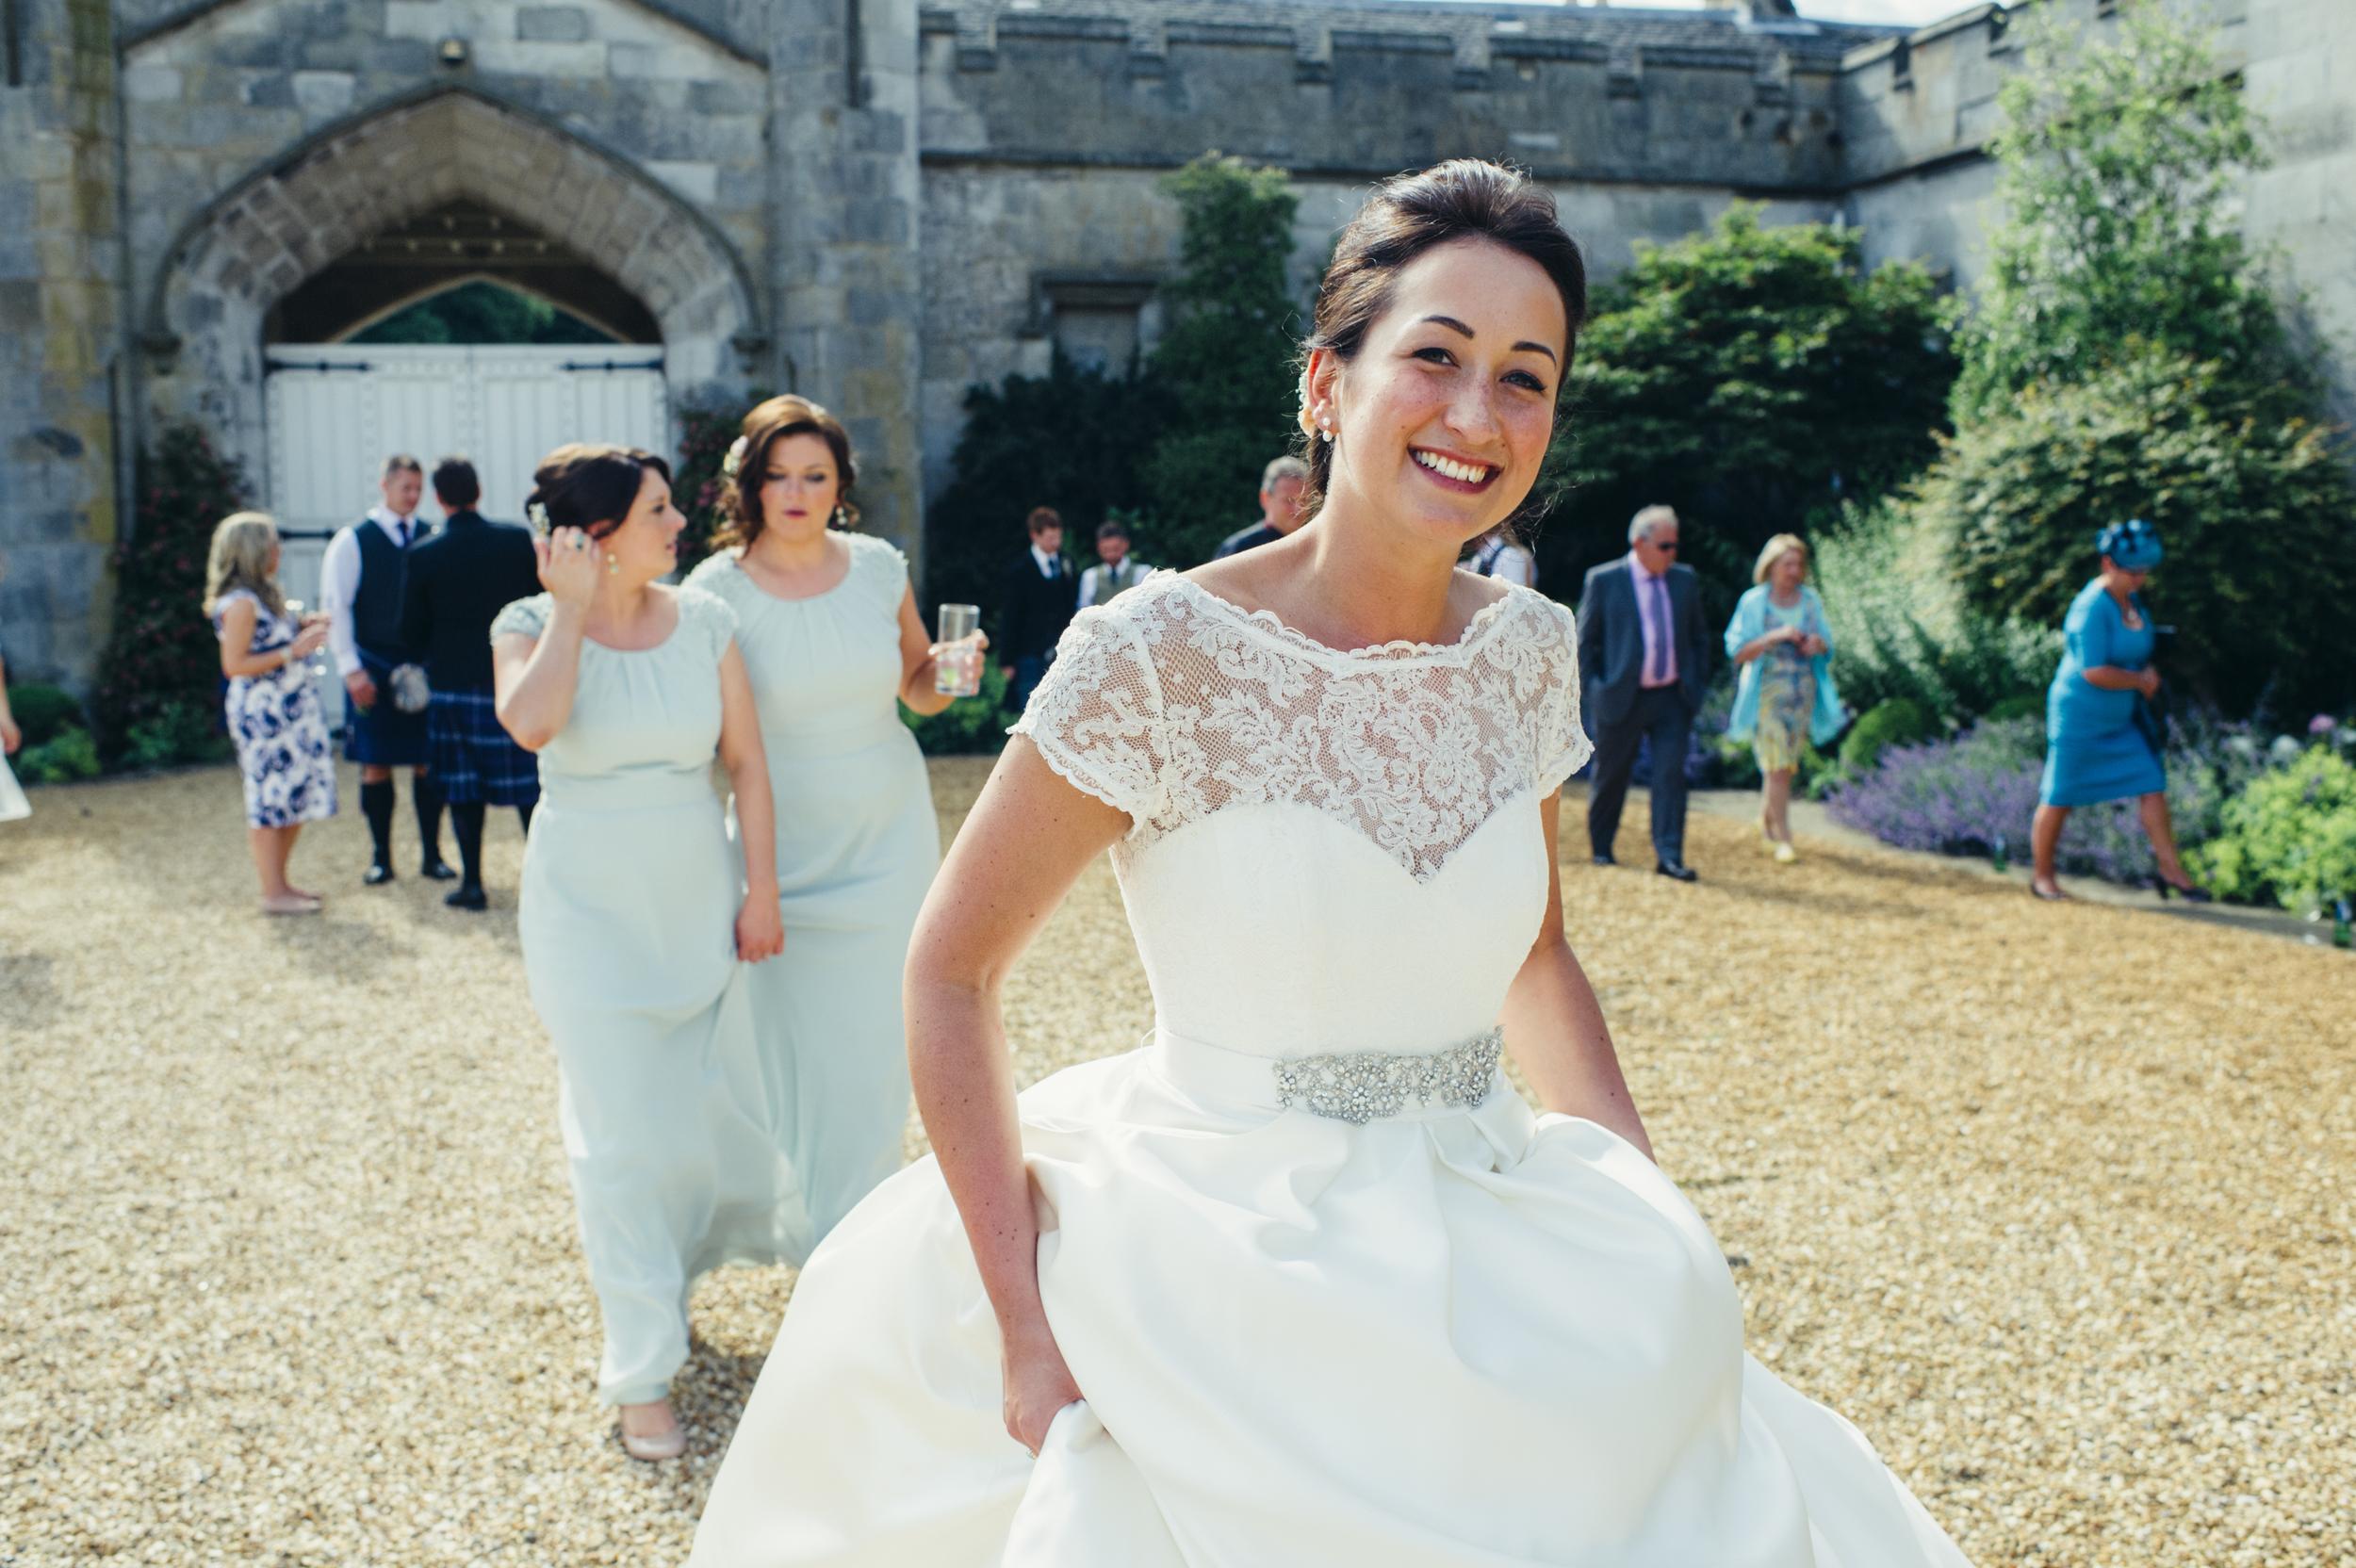 0150-lisa-devine-alternative-creative-wedding-photography-glasgow-edinburgh.JPG